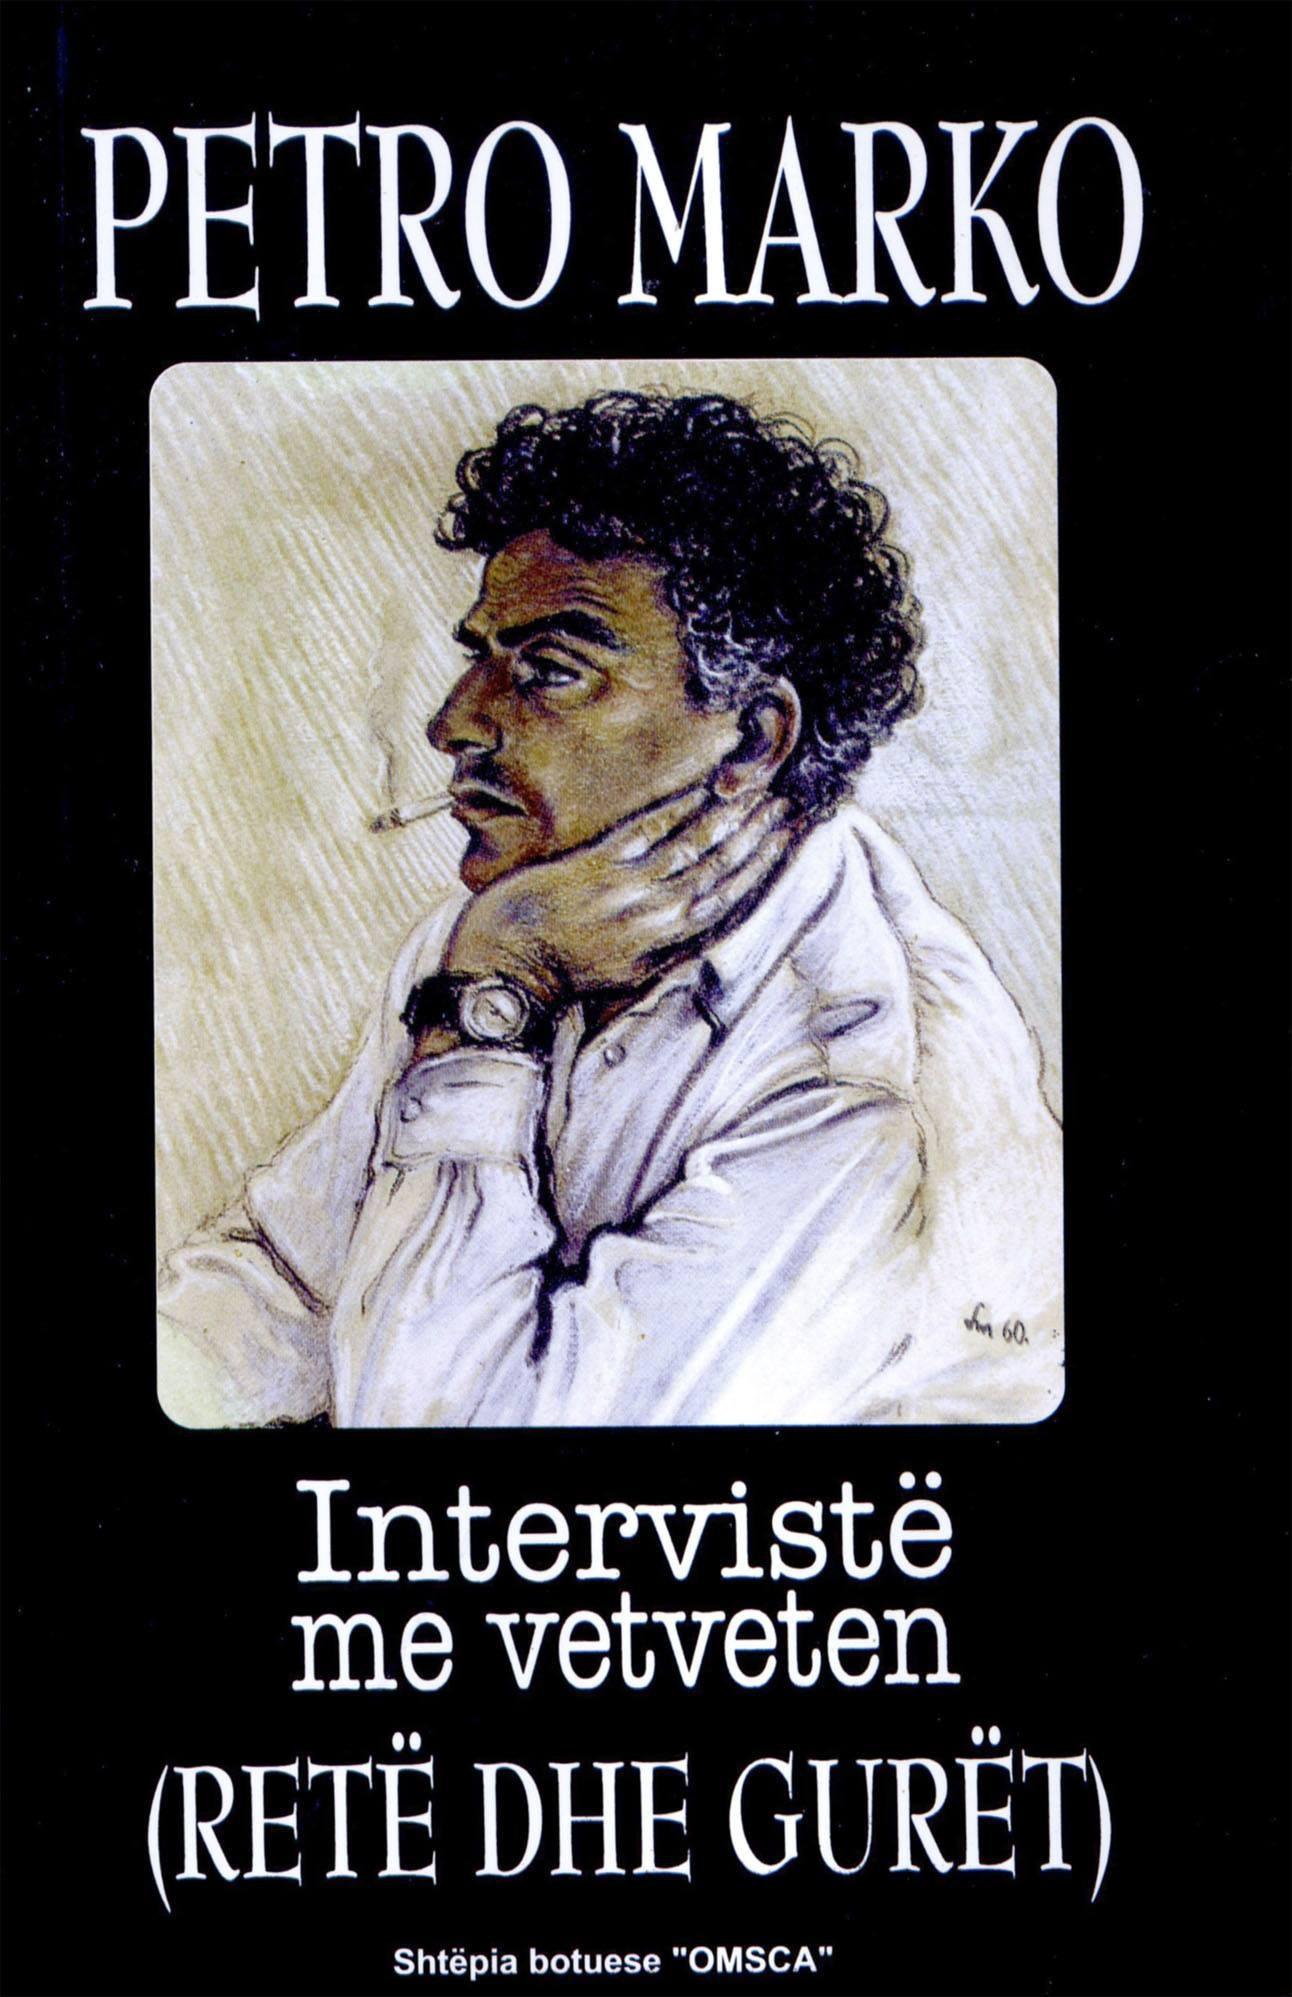 Interviste me vetveten (Rete dhe guret)